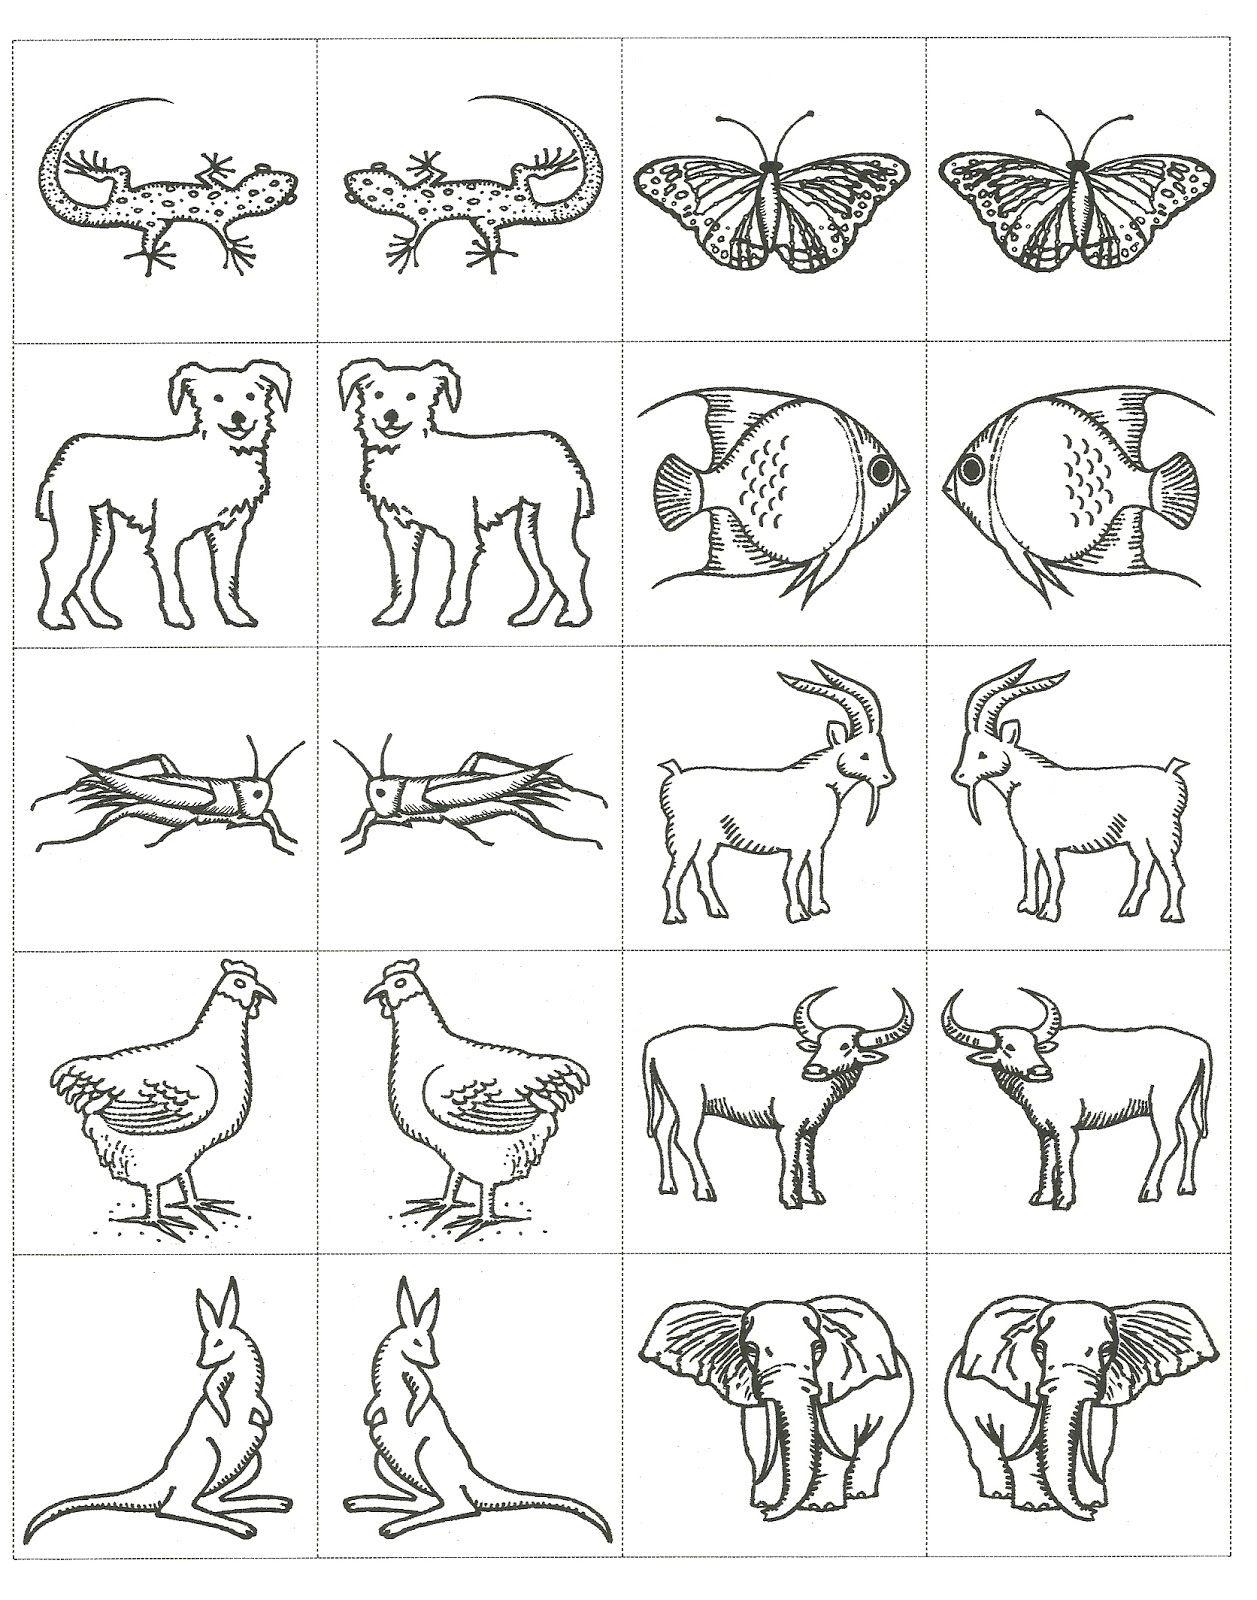 Noah\'s Ark Animals Coloring Pages | VBS | Pinterest | Preschool ...